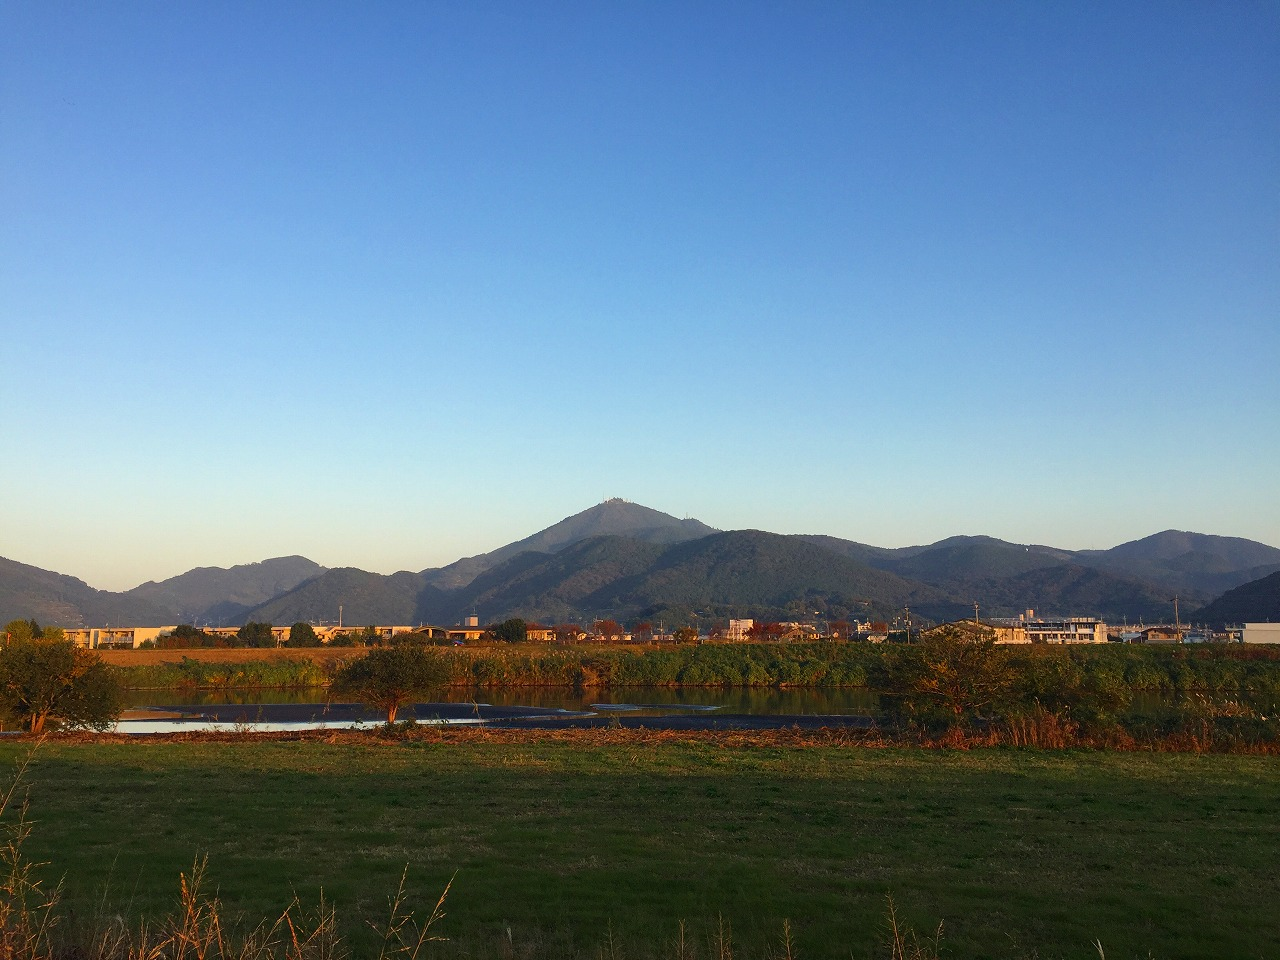 2016.11.16 今朝の金峰山